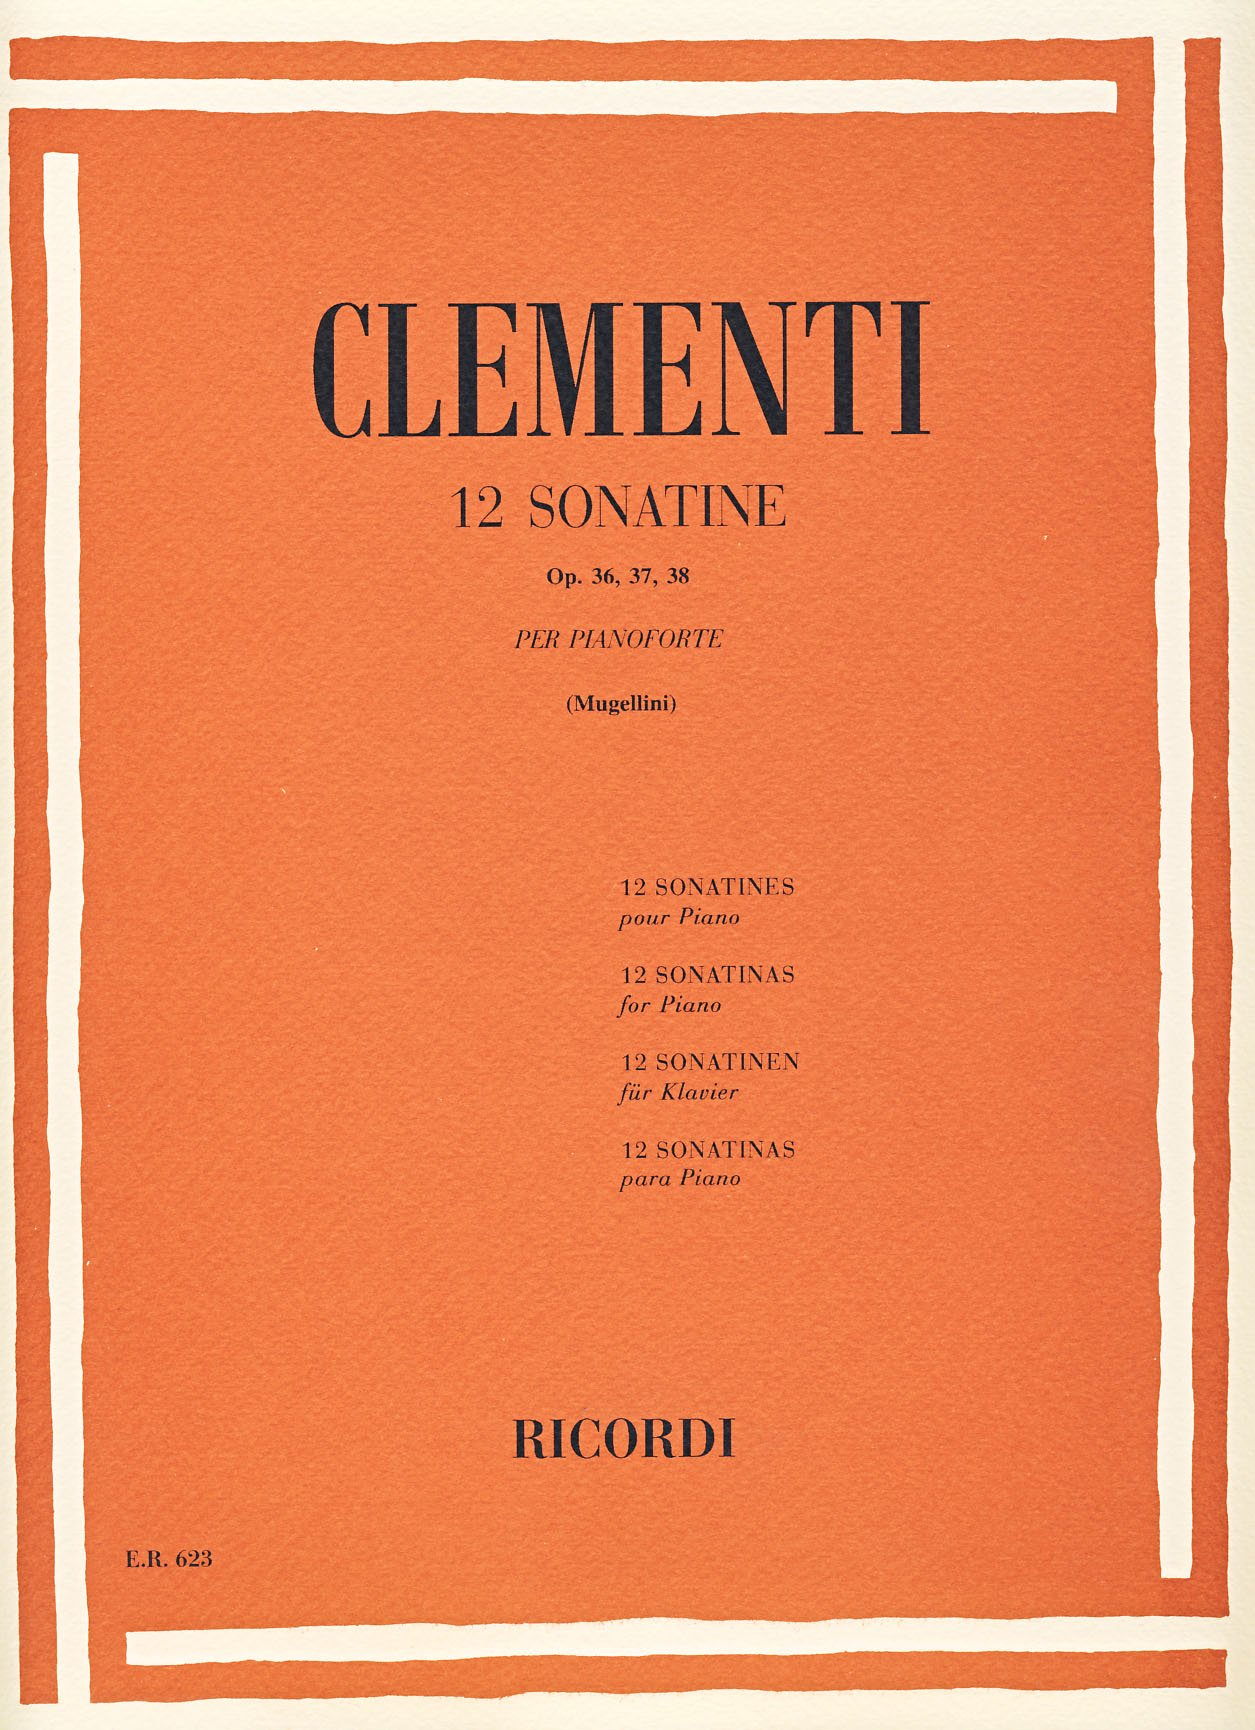 12 Sonatine Op. 36, 37, 38 Per Pianoforte (Francese) Copertina flessibile – 1 gen 1984 Muzio Clementi Ricordi 0041806239 Musique